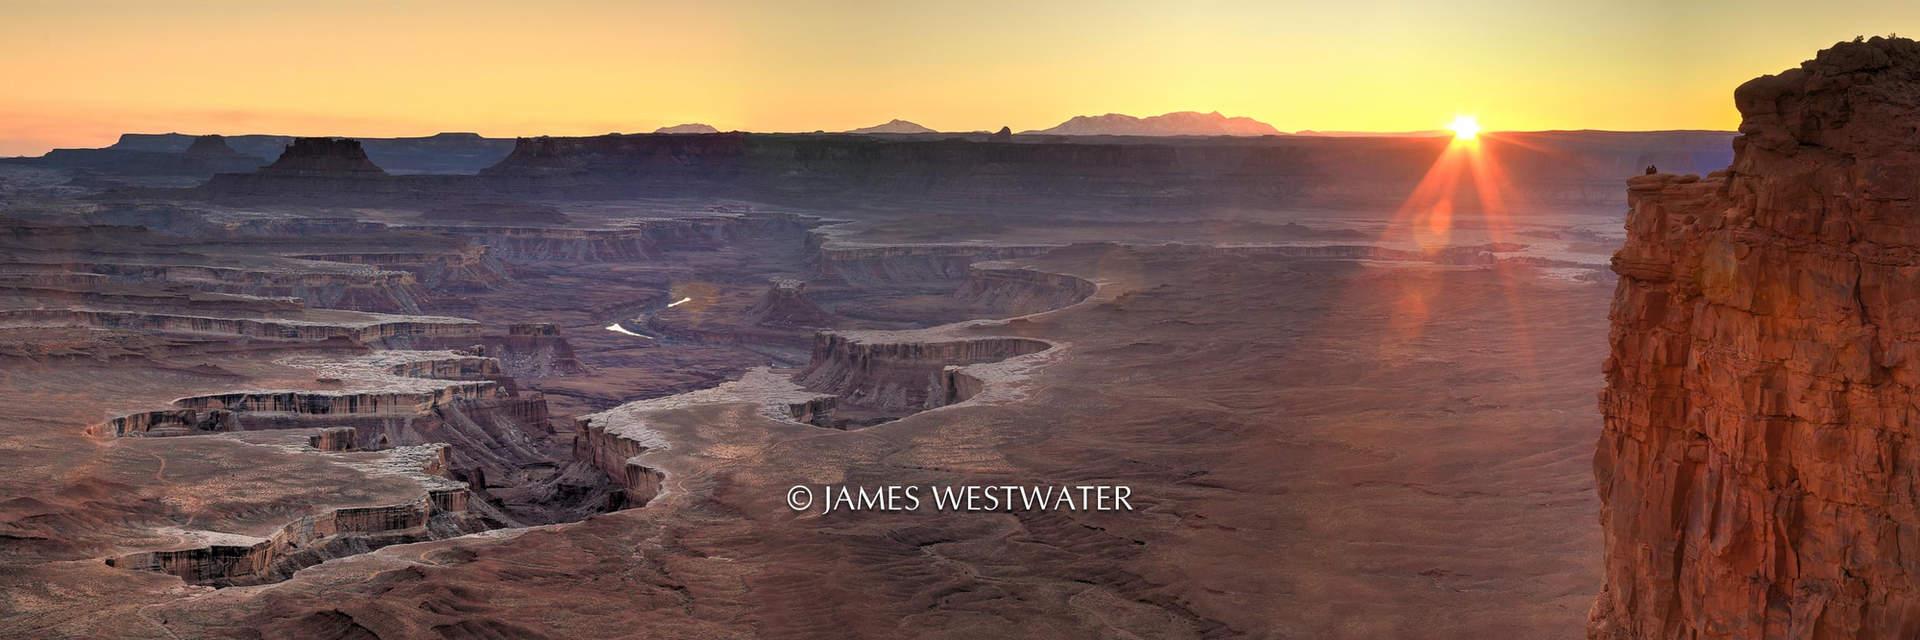 Sharing Nature's Splendor, Panorama, Green River Overlook, Canyonlands National Park, Utah